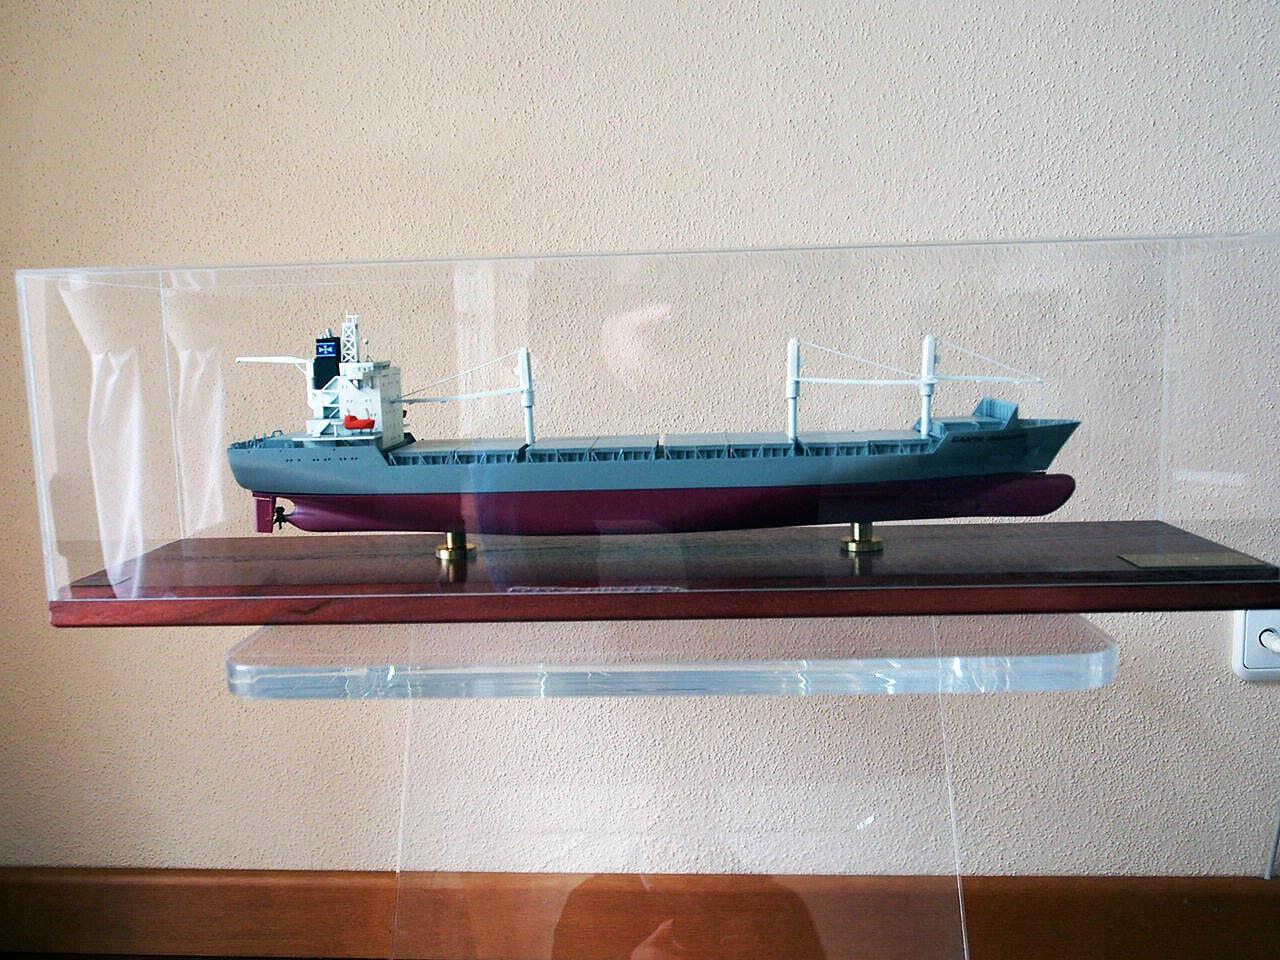 Muy bonito barco modelo buque portacontenedores MS  Santa giuliana  1 400